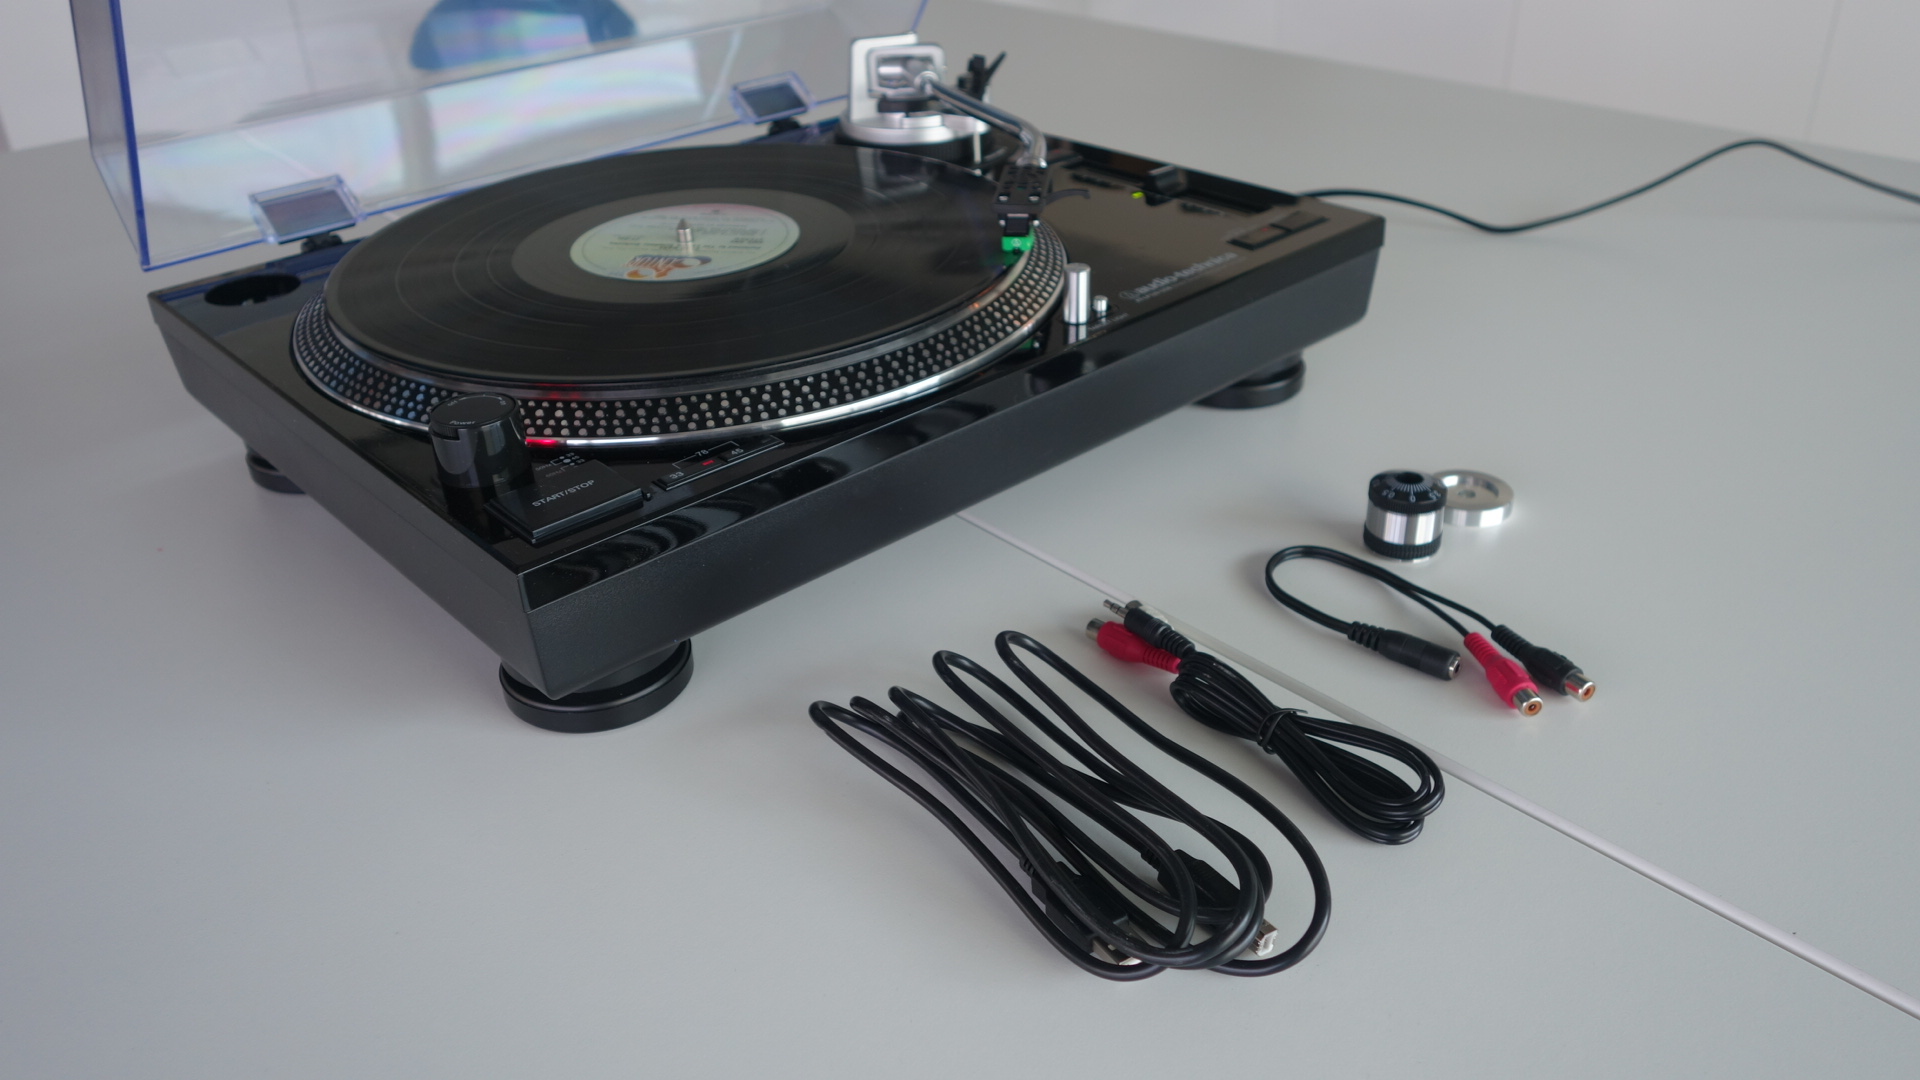 Audio Technica At : audio technica at lp120bk usb review samma3a tech ~ Vivirlamusica.com Haus und Dekorationen